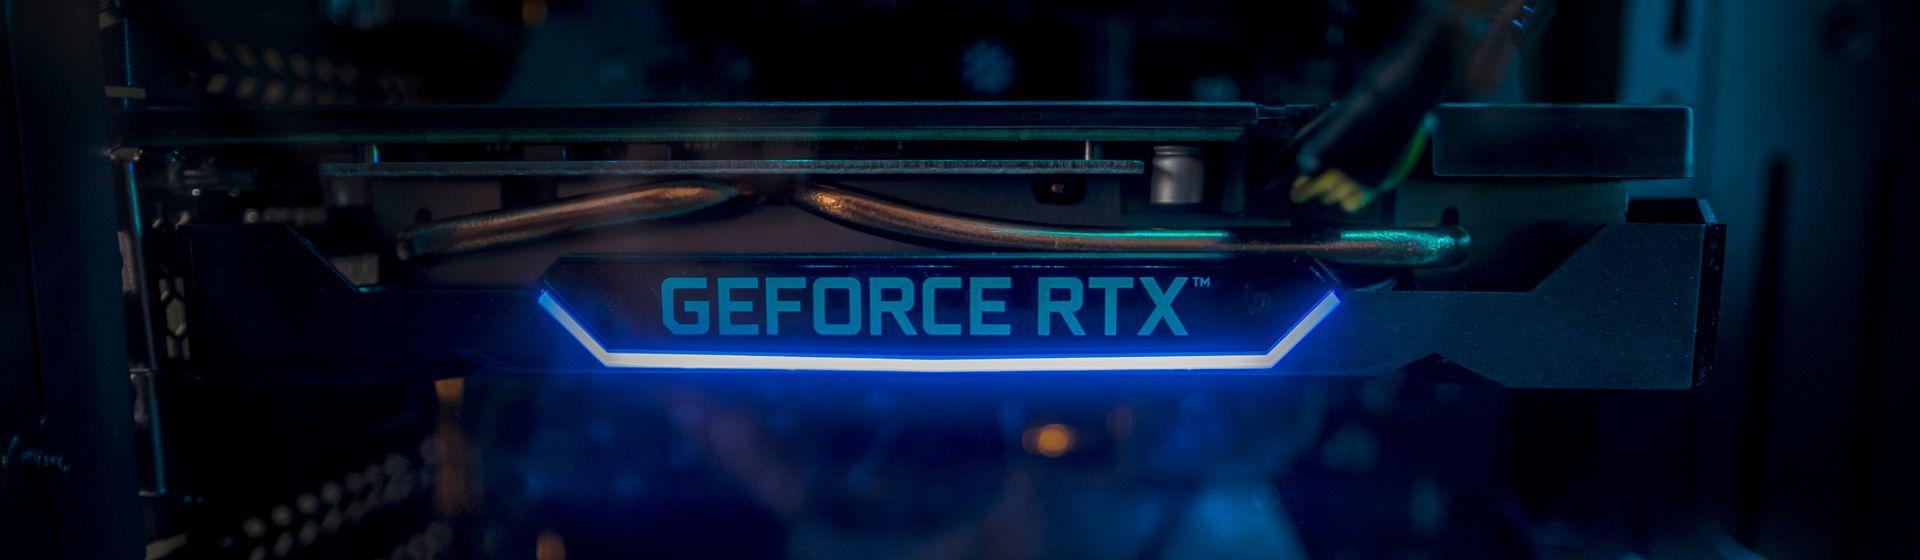 GTX 1660 Ti vs RTX 2060: qual placa de vídeo comprar?